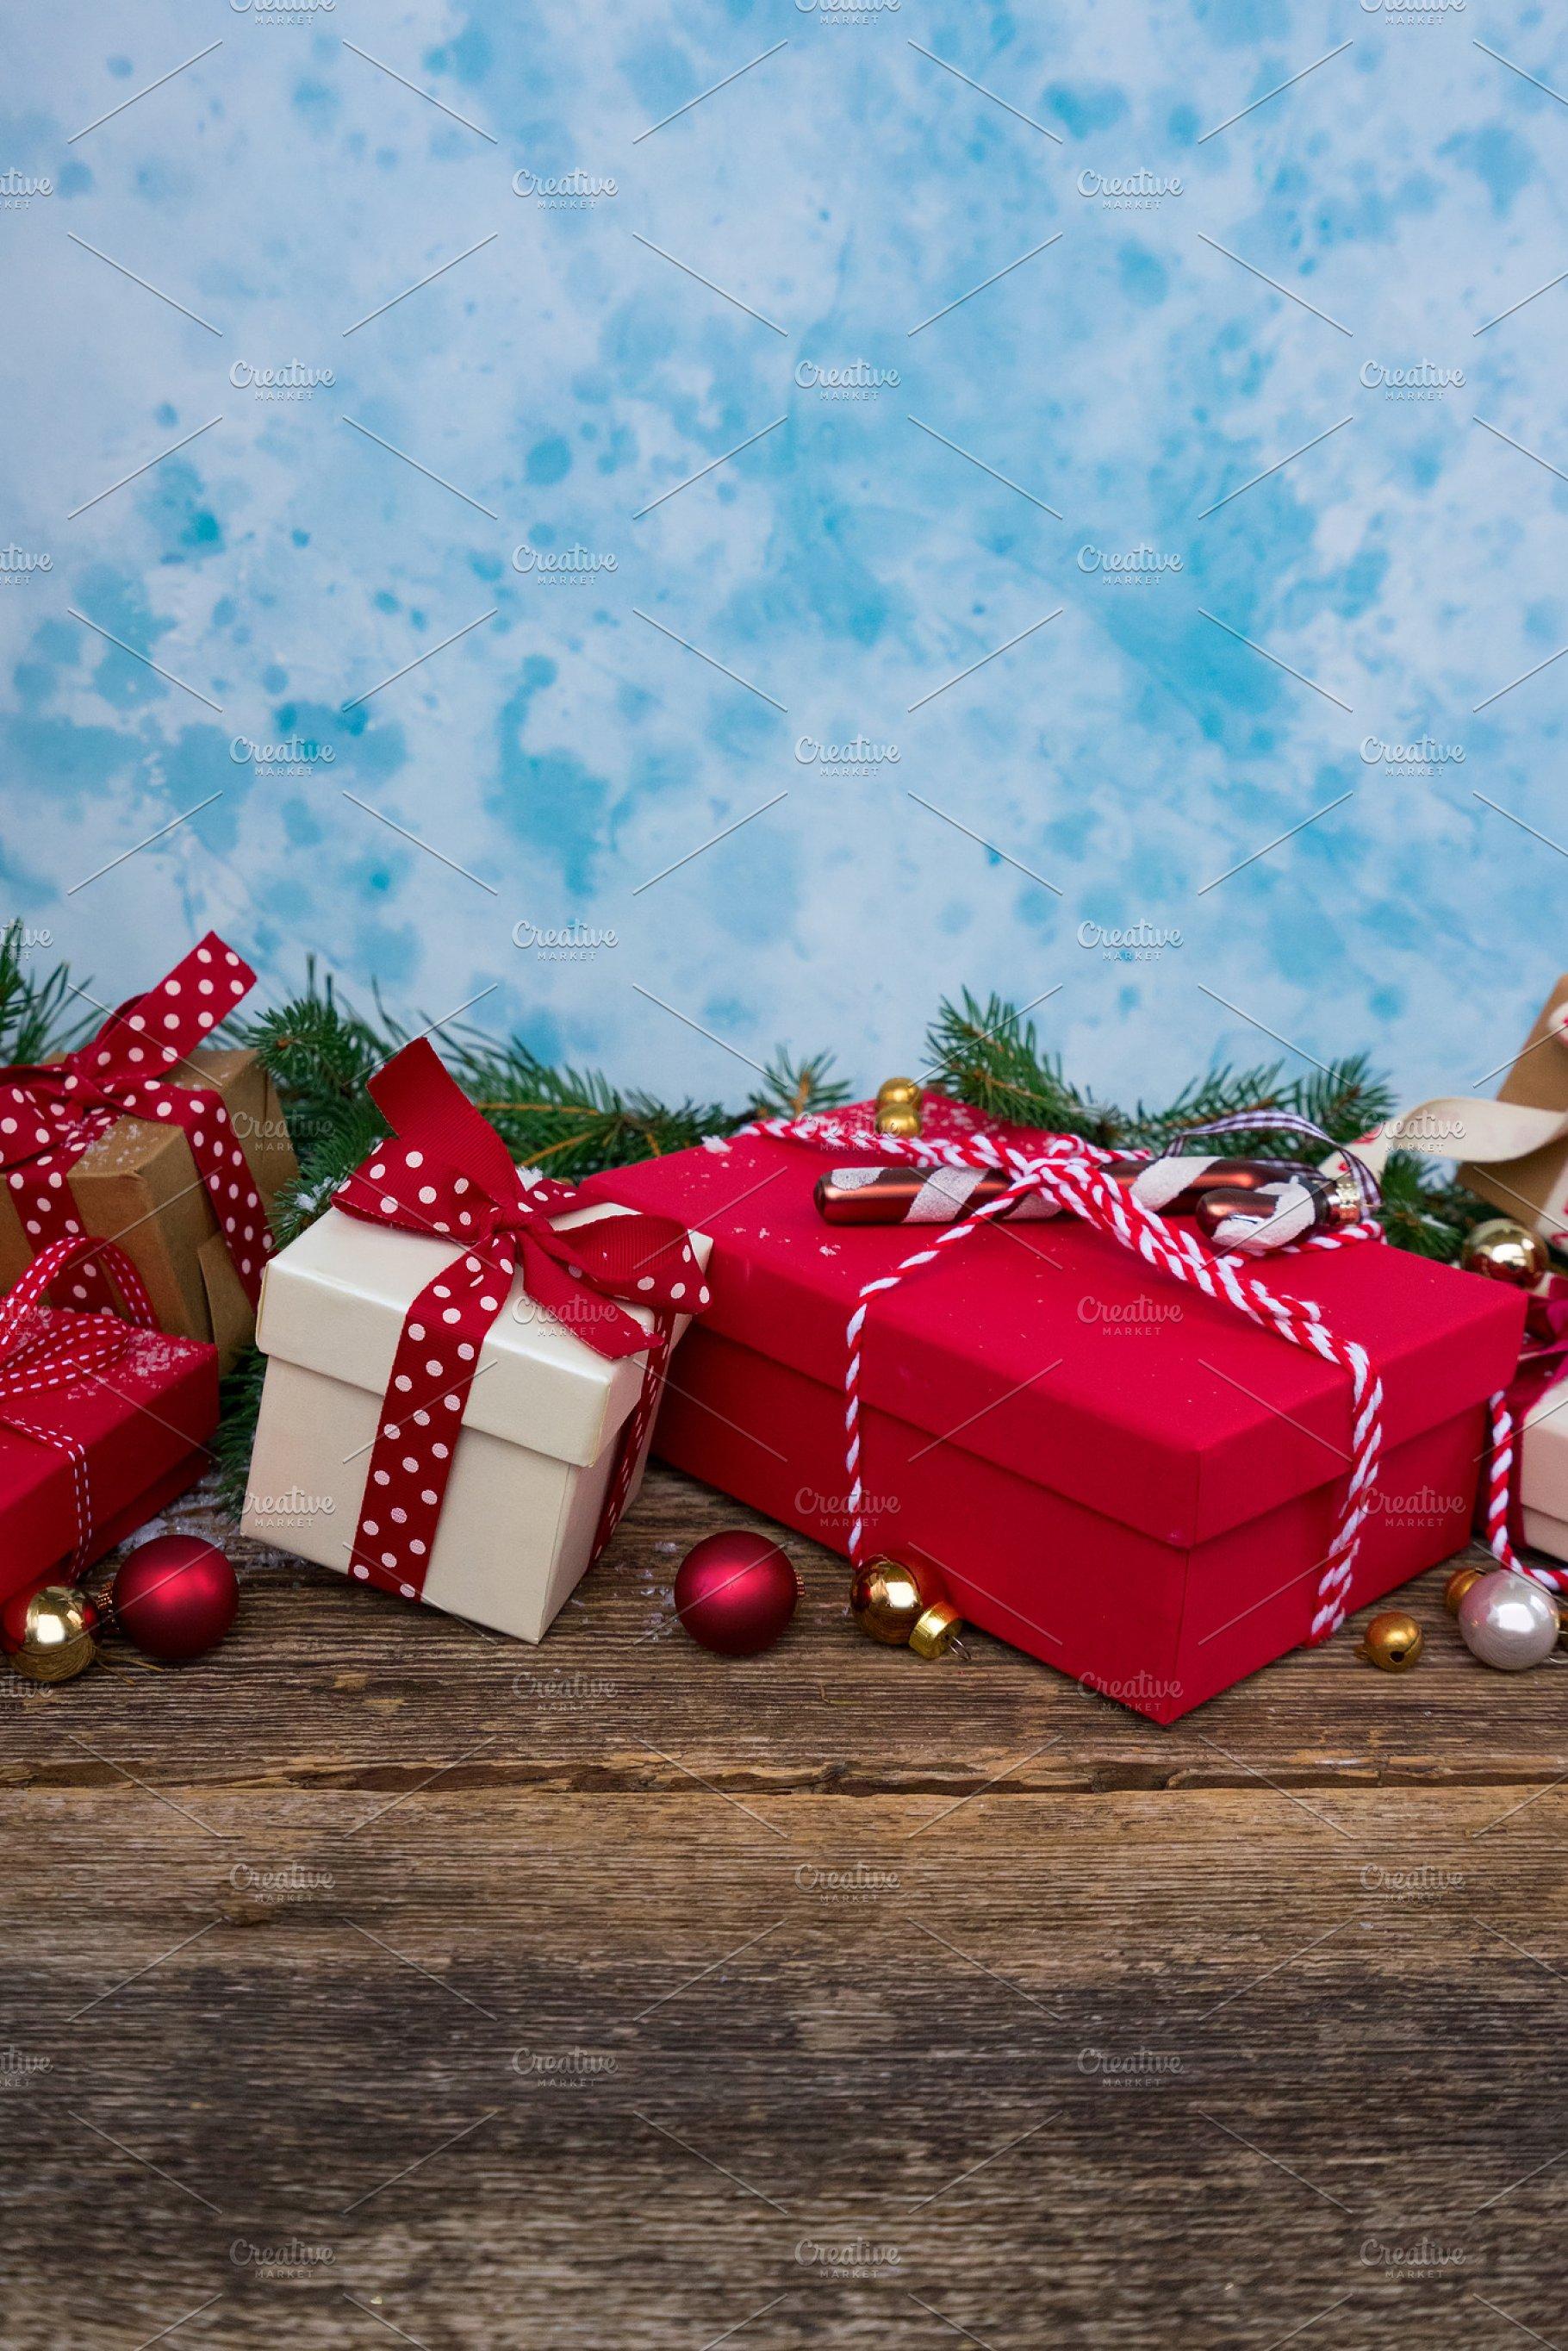 Christmas Gift Giving Images.Christmas Gift Giving Holiday Photos Creative Market